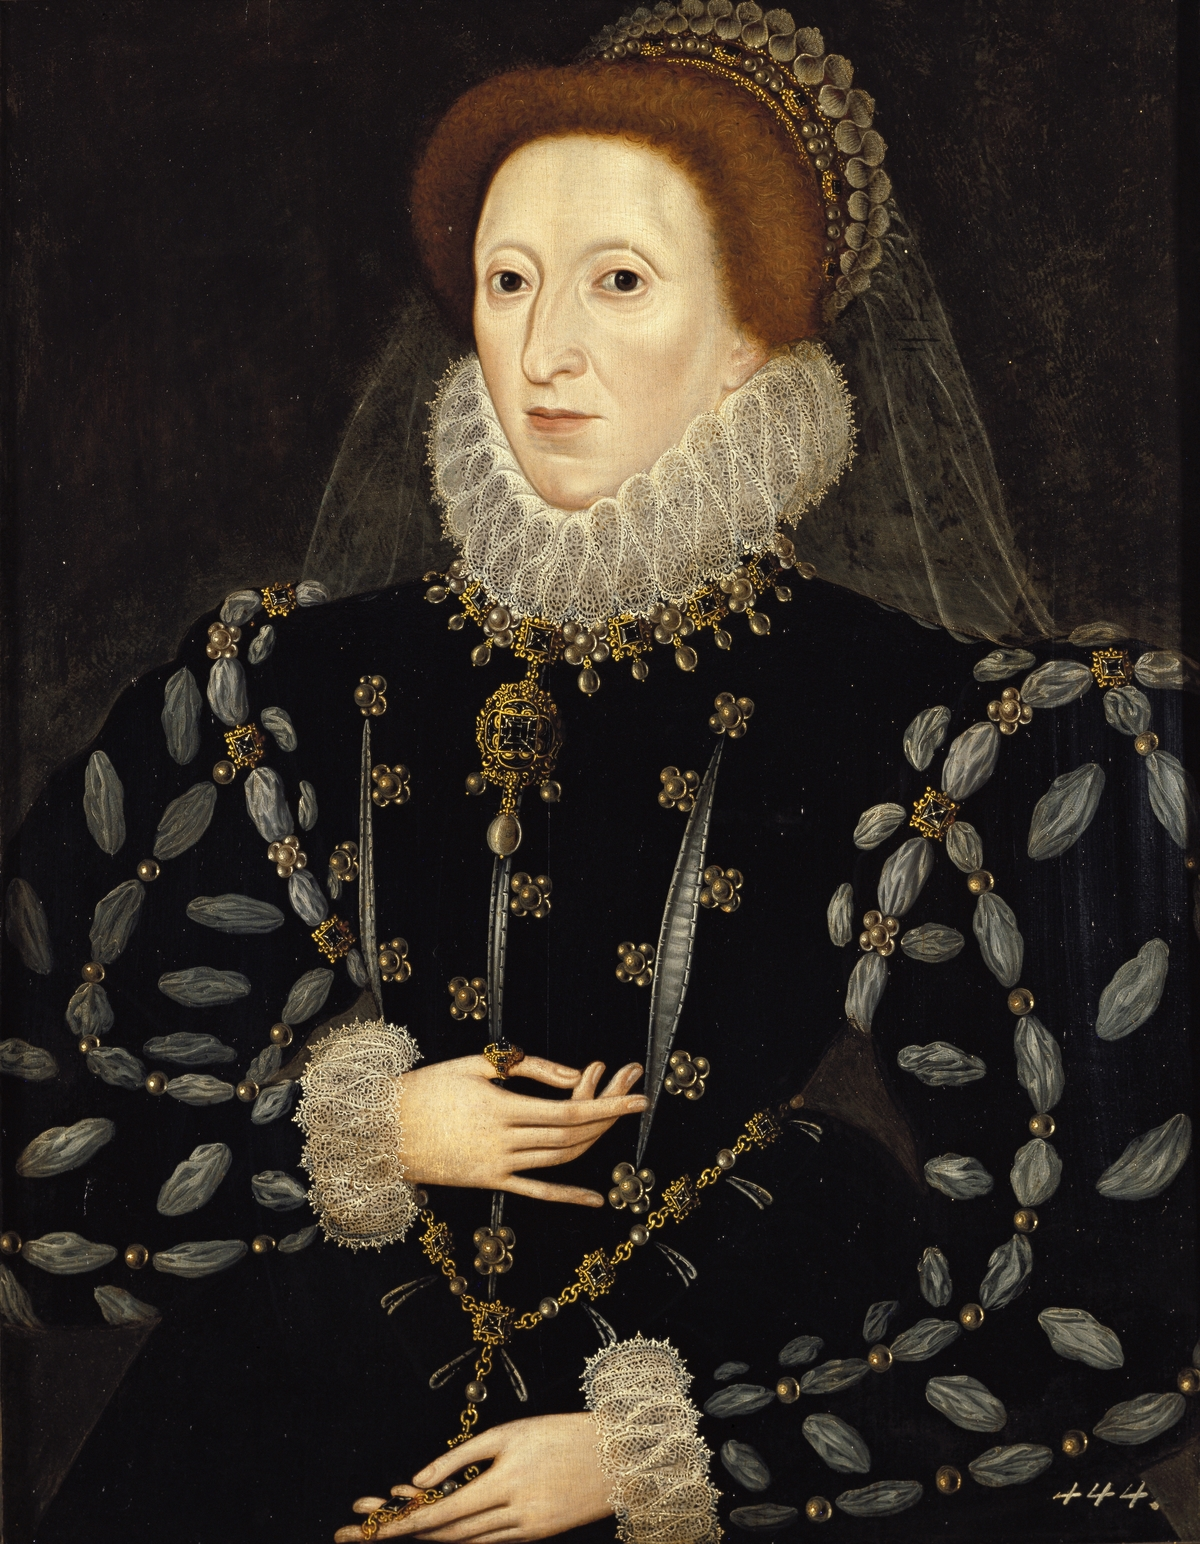 queen elizabeth i real face revealed